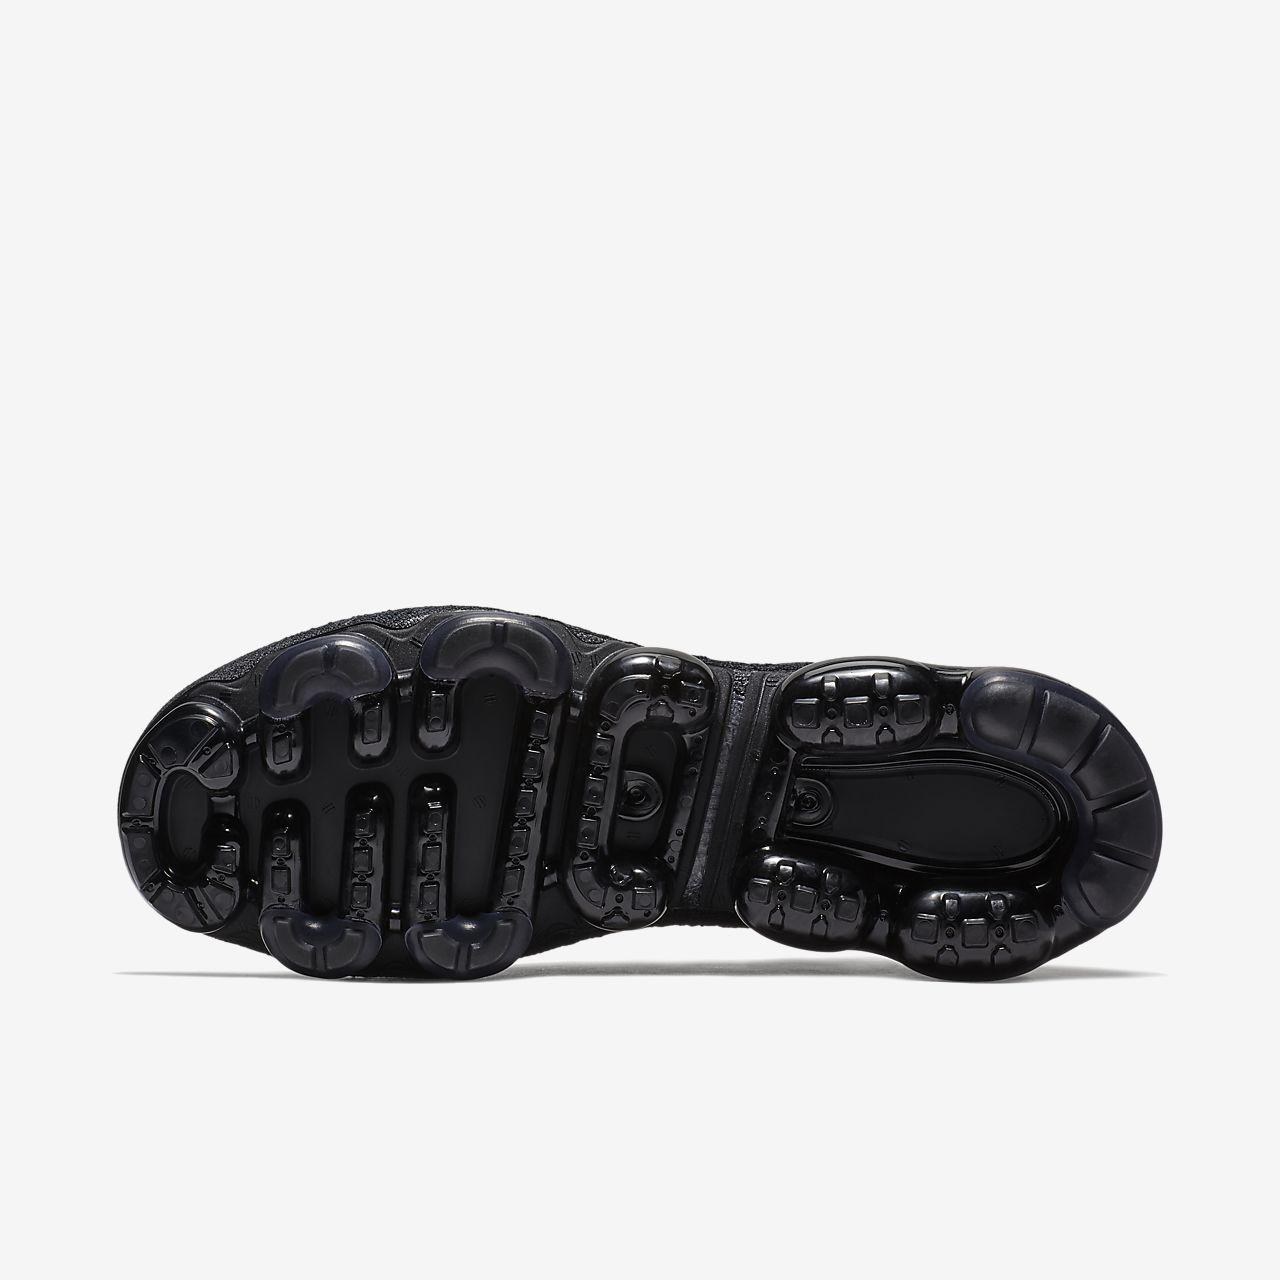 Sapatilhas de running Nike Air VaporMax Flyknit para homem